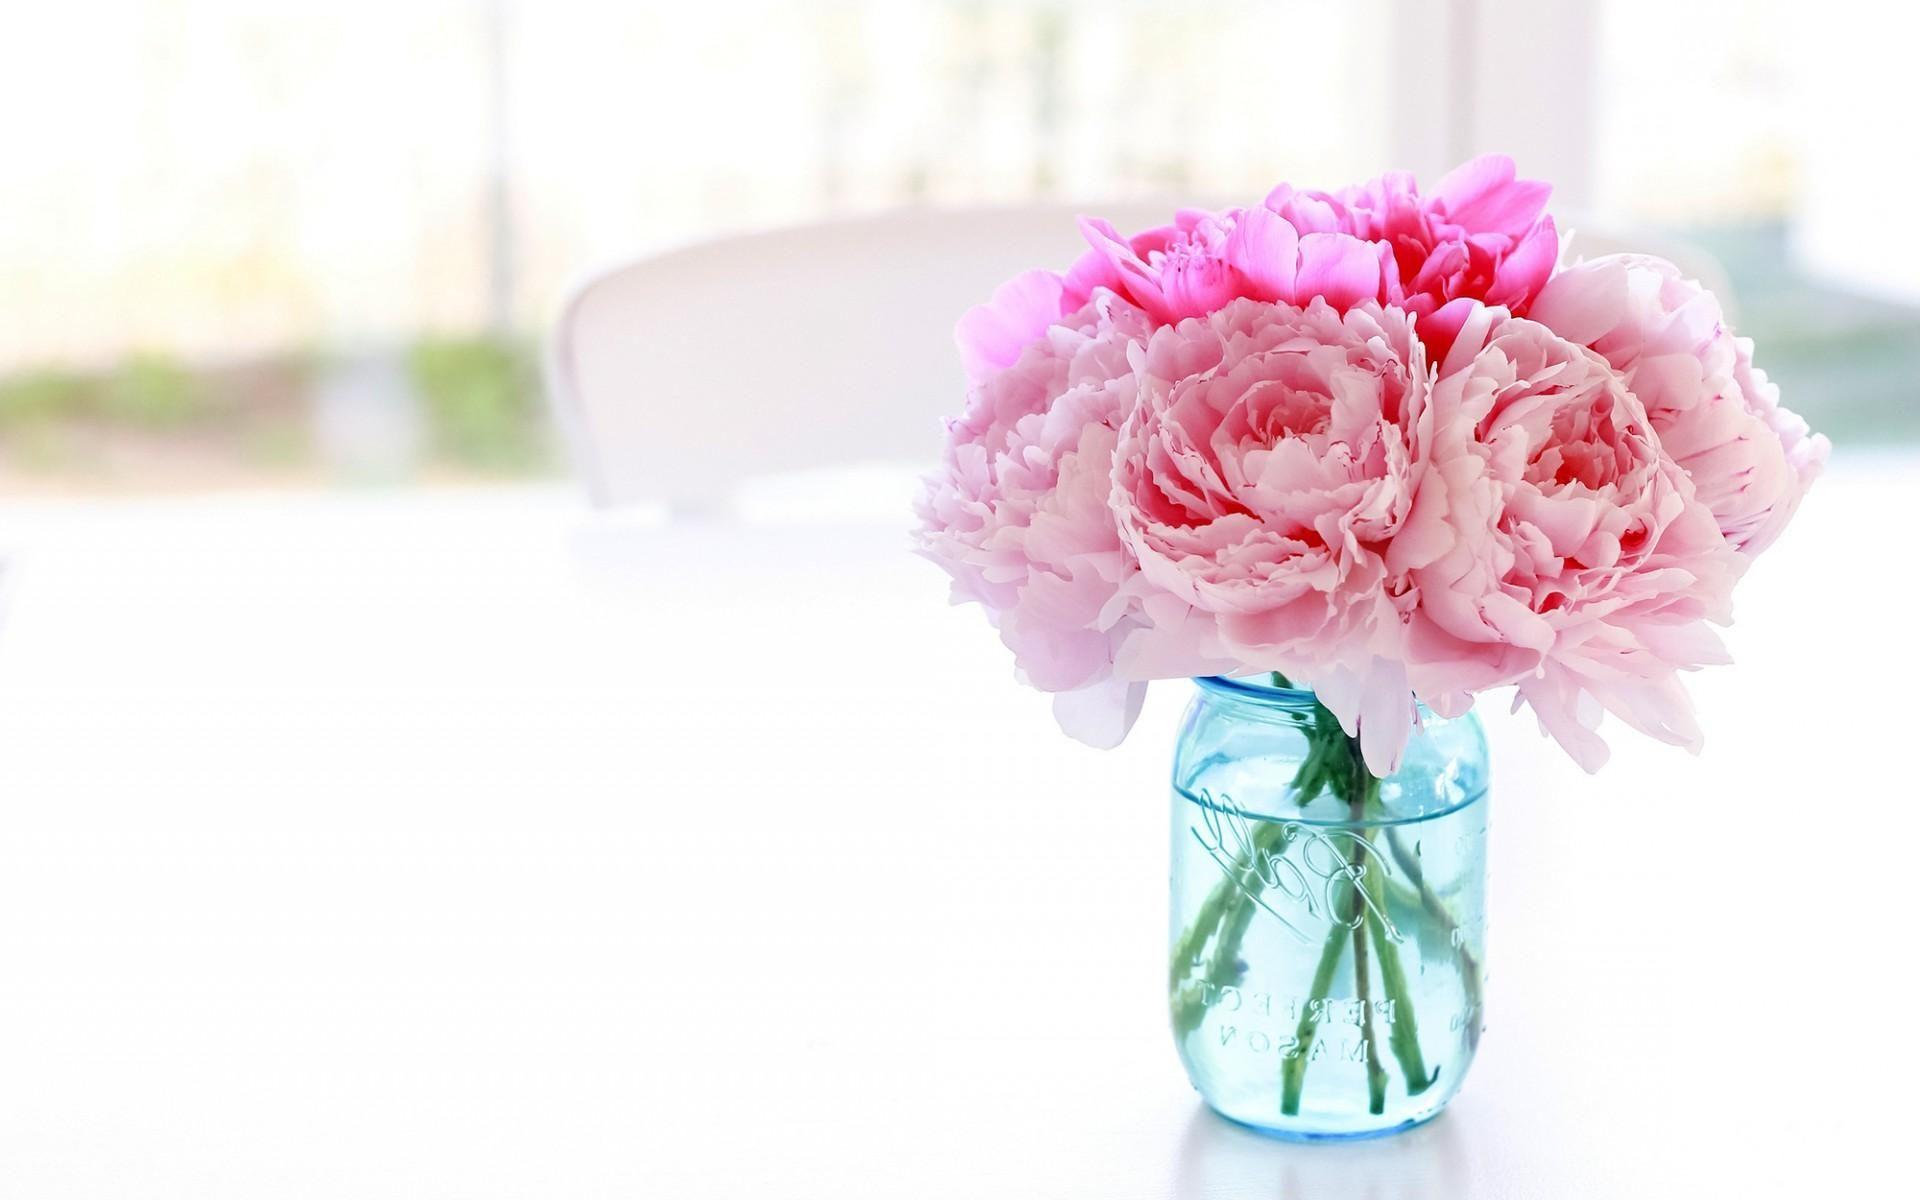 Peony Wallpaper Pink Flowers Flowers Fantastic flower vase wallpaper images